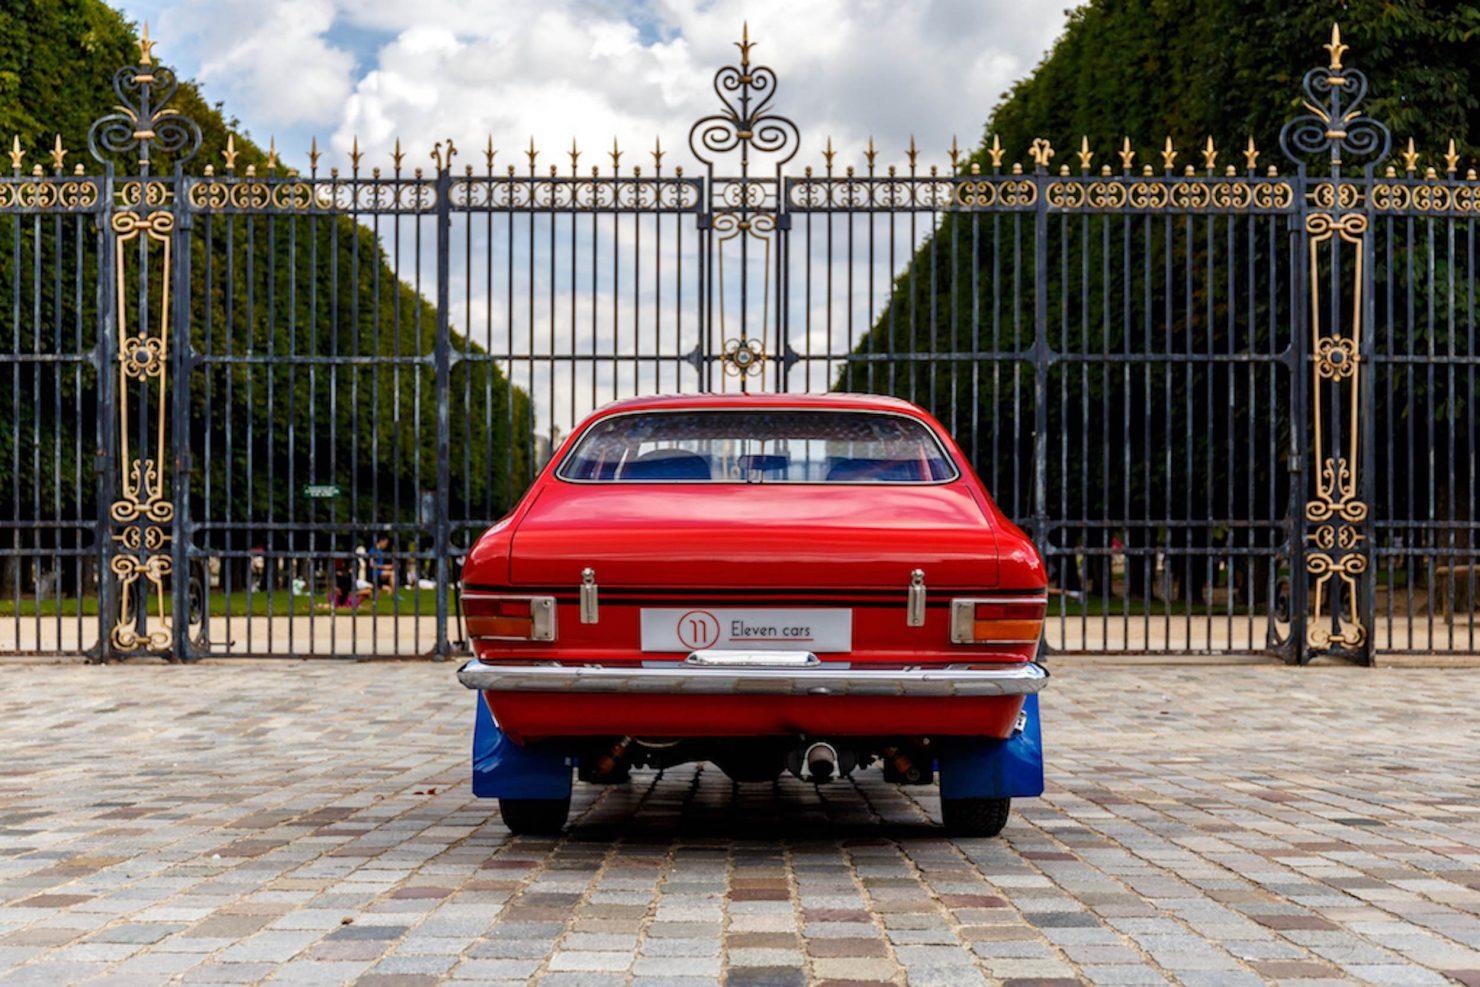 opel kadett rallye car 15 1480x987 - 1969 Opel Rallye Kadett